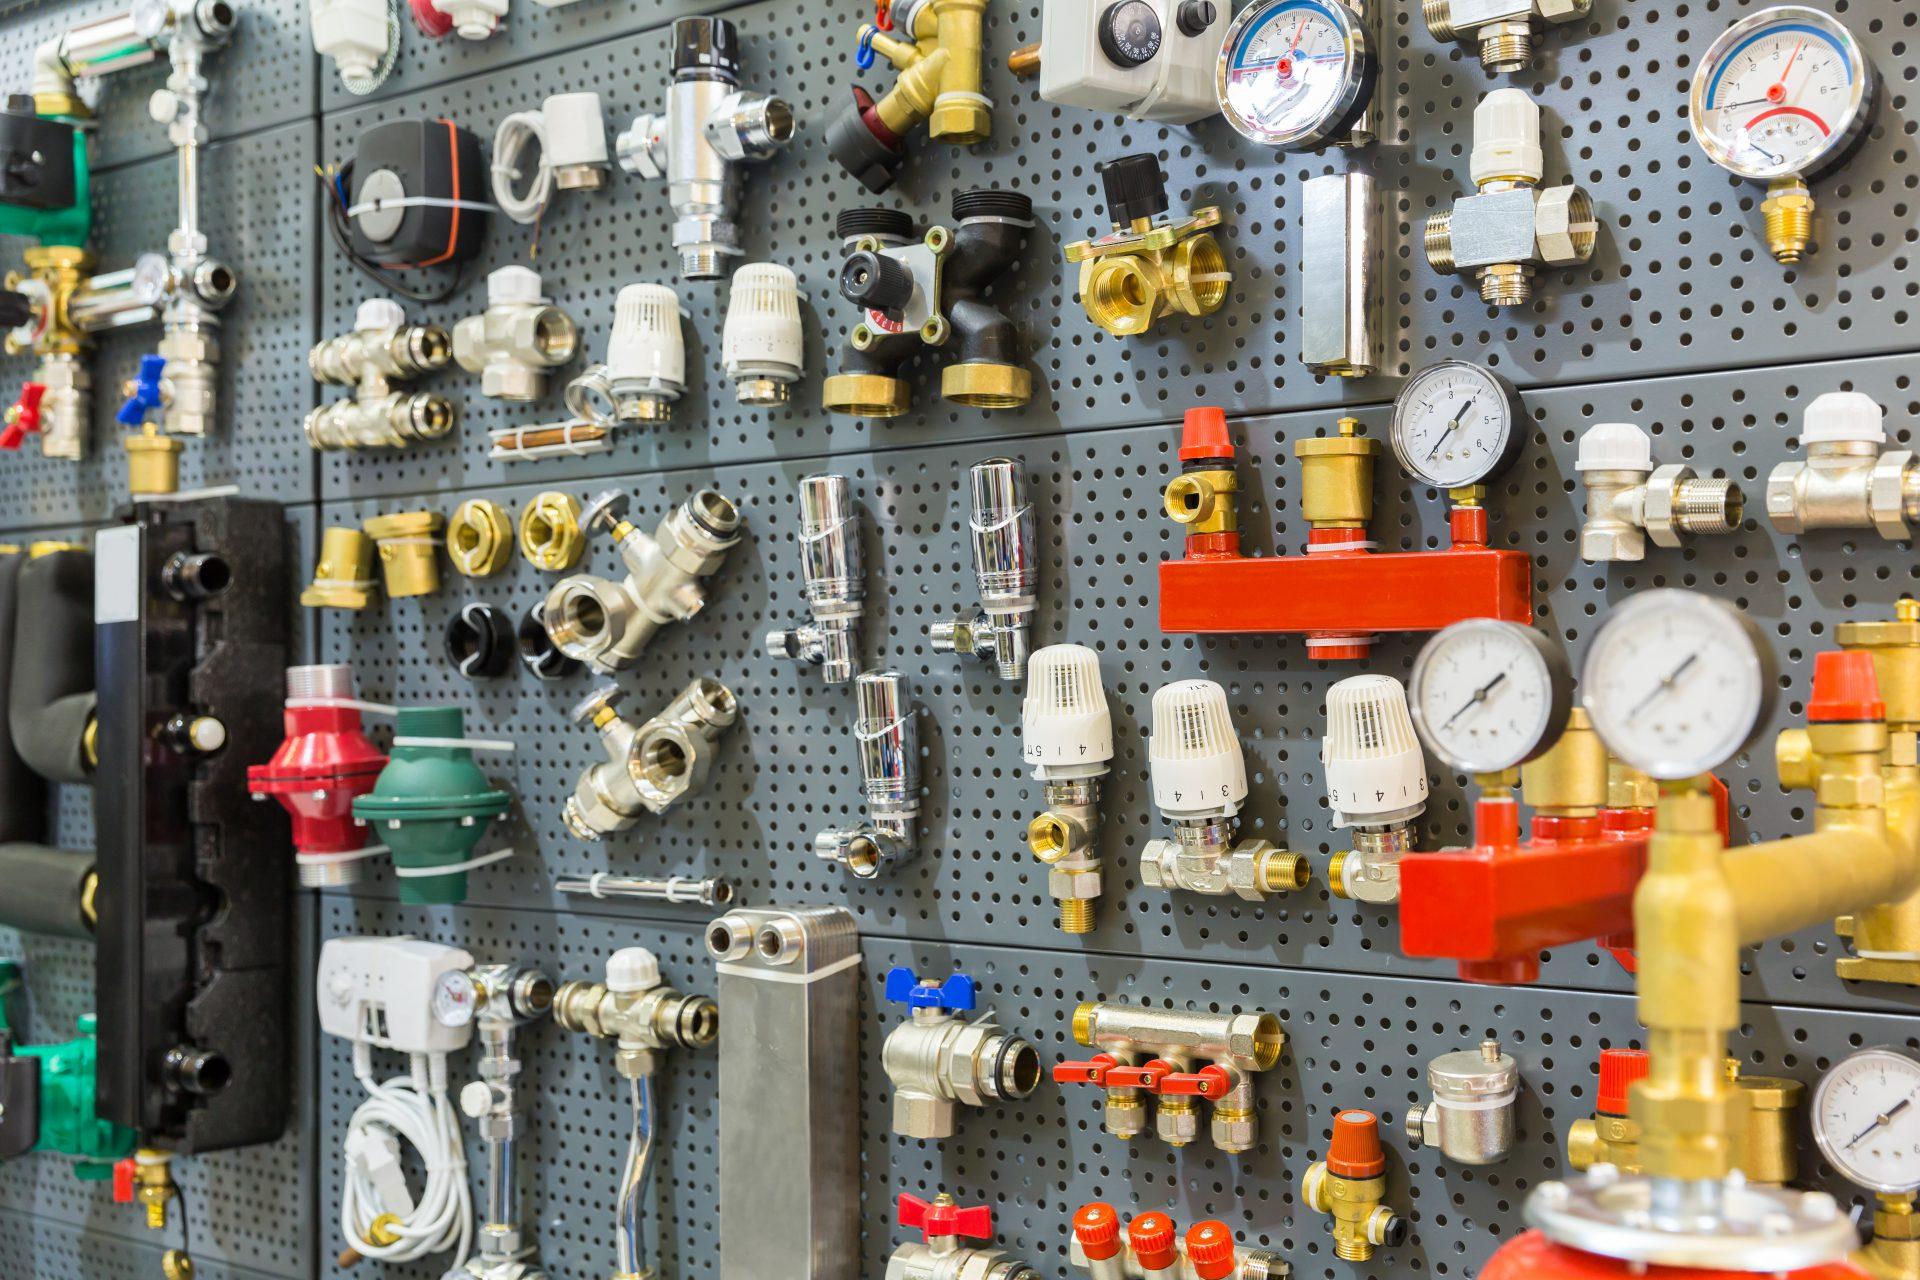 plumbing-equipment-pressure-sensors-and-P3VGHBL